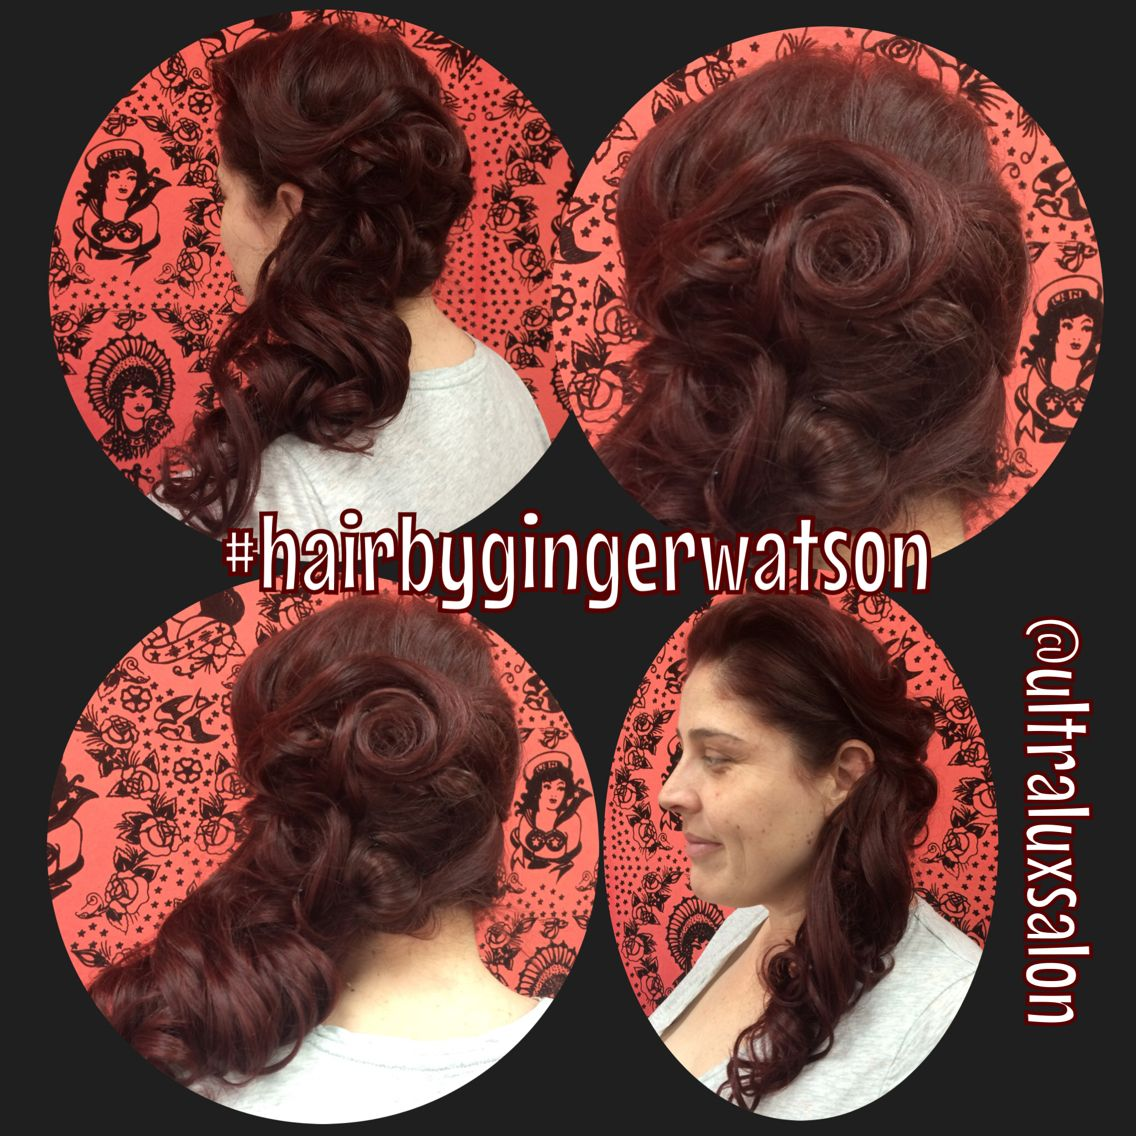 #vintagehair #vintagehairsalon #avedacolor #redombre #pinup #pinuphair #50s #weddinghair